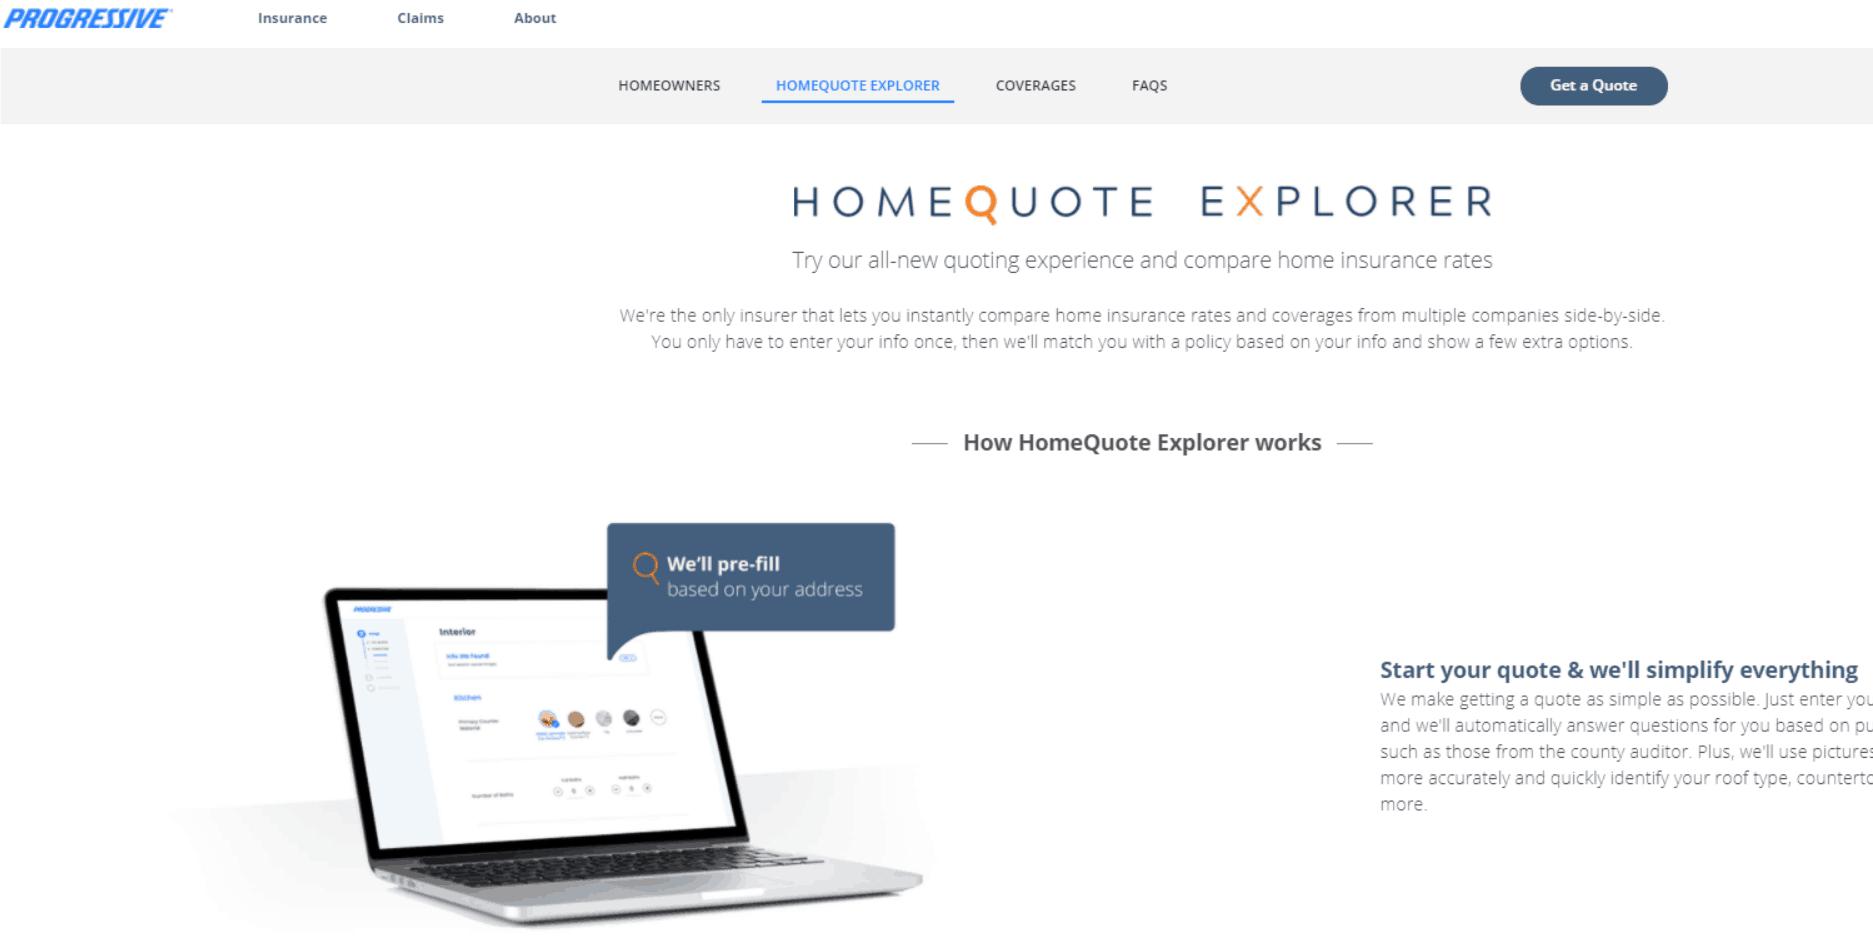 Progressive Get A Quote Progressive Launches Homequote Explorer Featuring Multicarrier